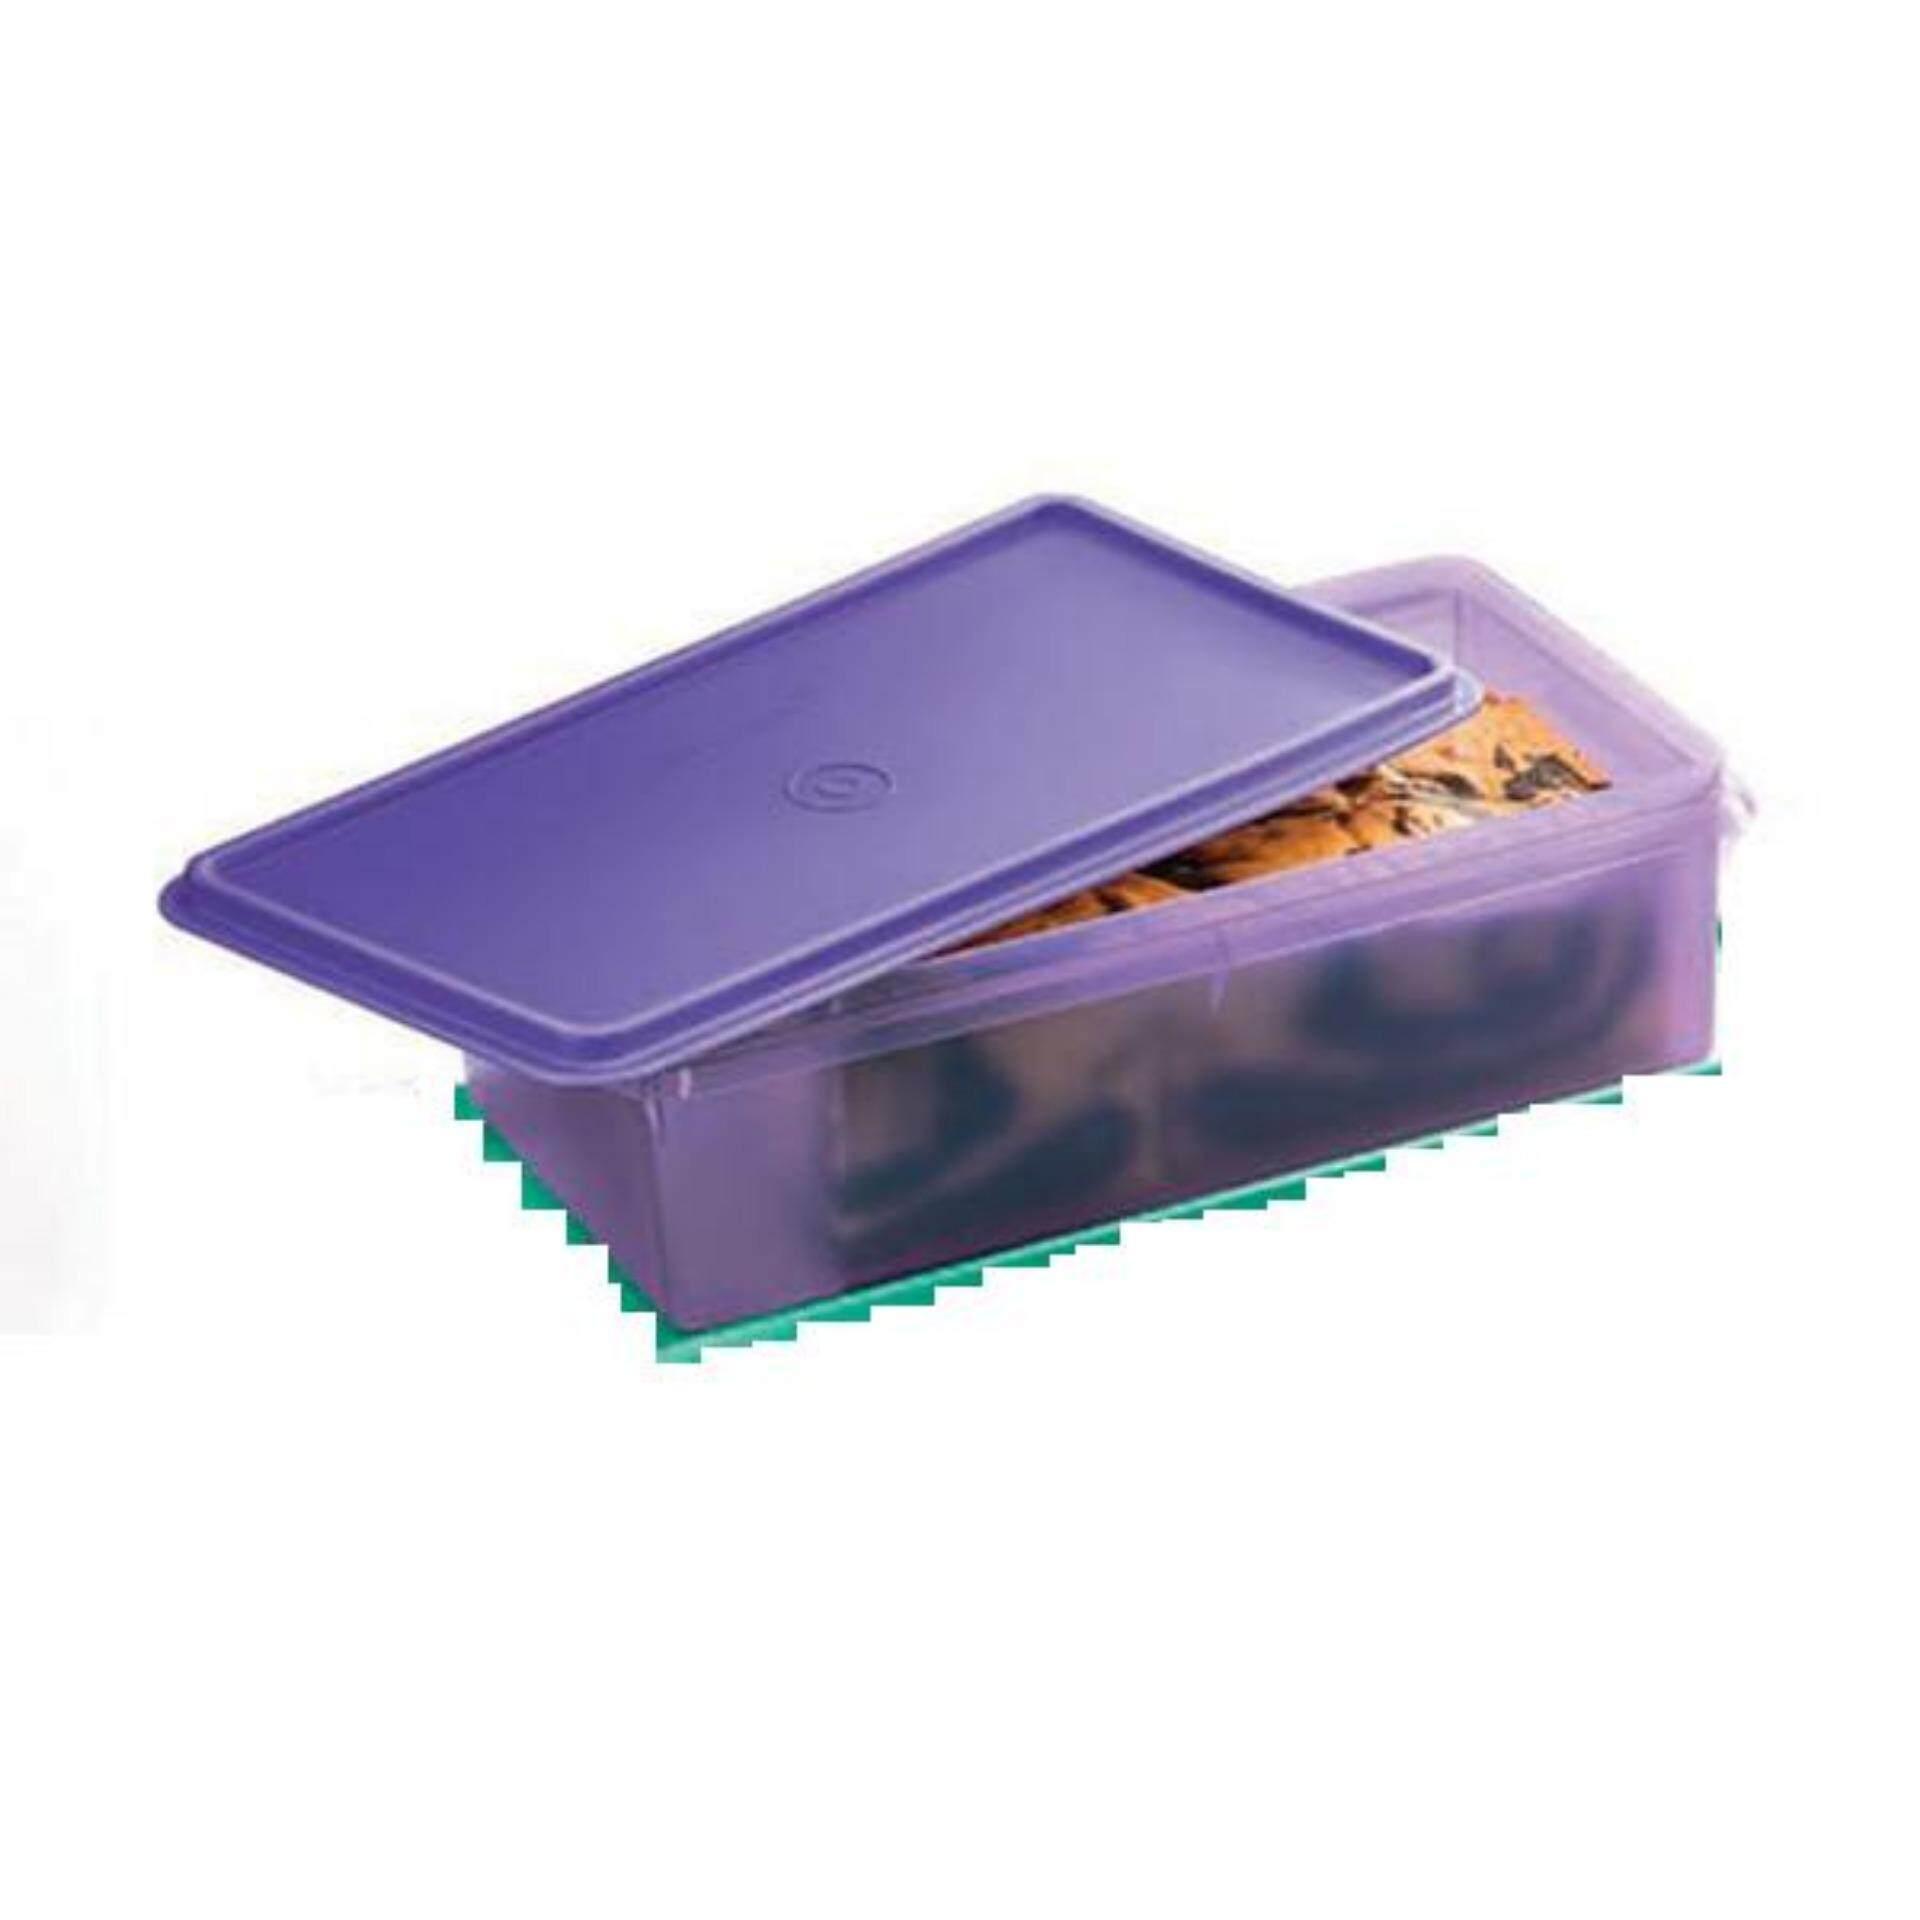 Tupperware Sweet Keeper (1) 3L - Purple